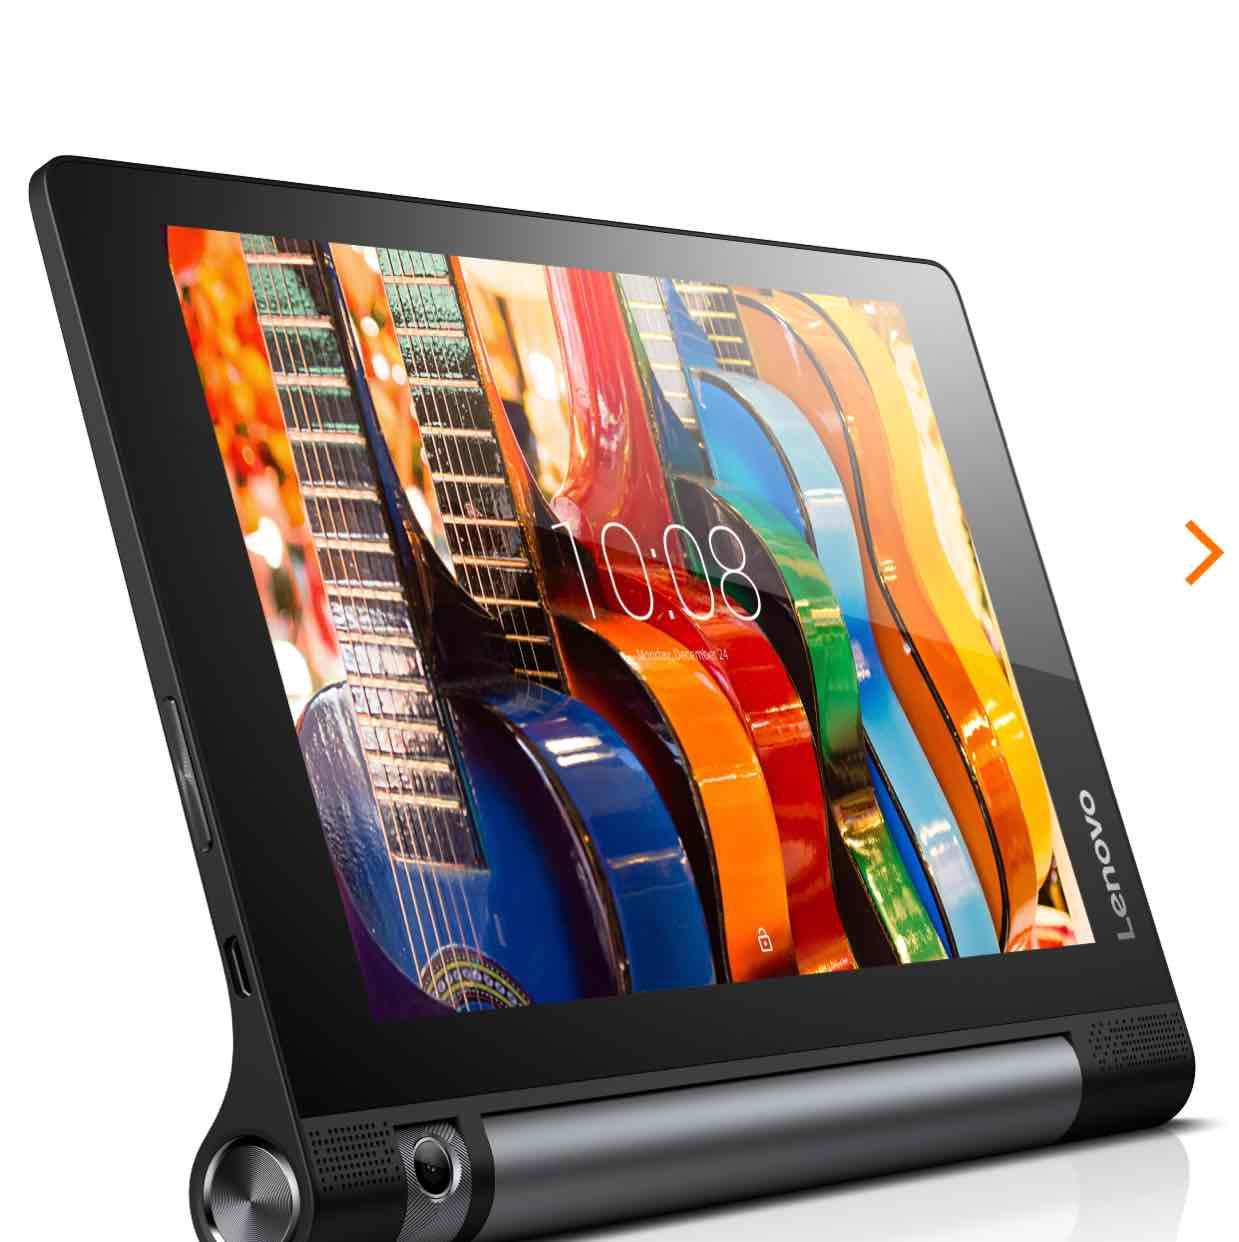 "Lenovo YOGA TAB 3-850L 8"" HD IPS-Display, Quad-Core, 2GB RAM, 16GB Flash, LTE, Android 5.1"